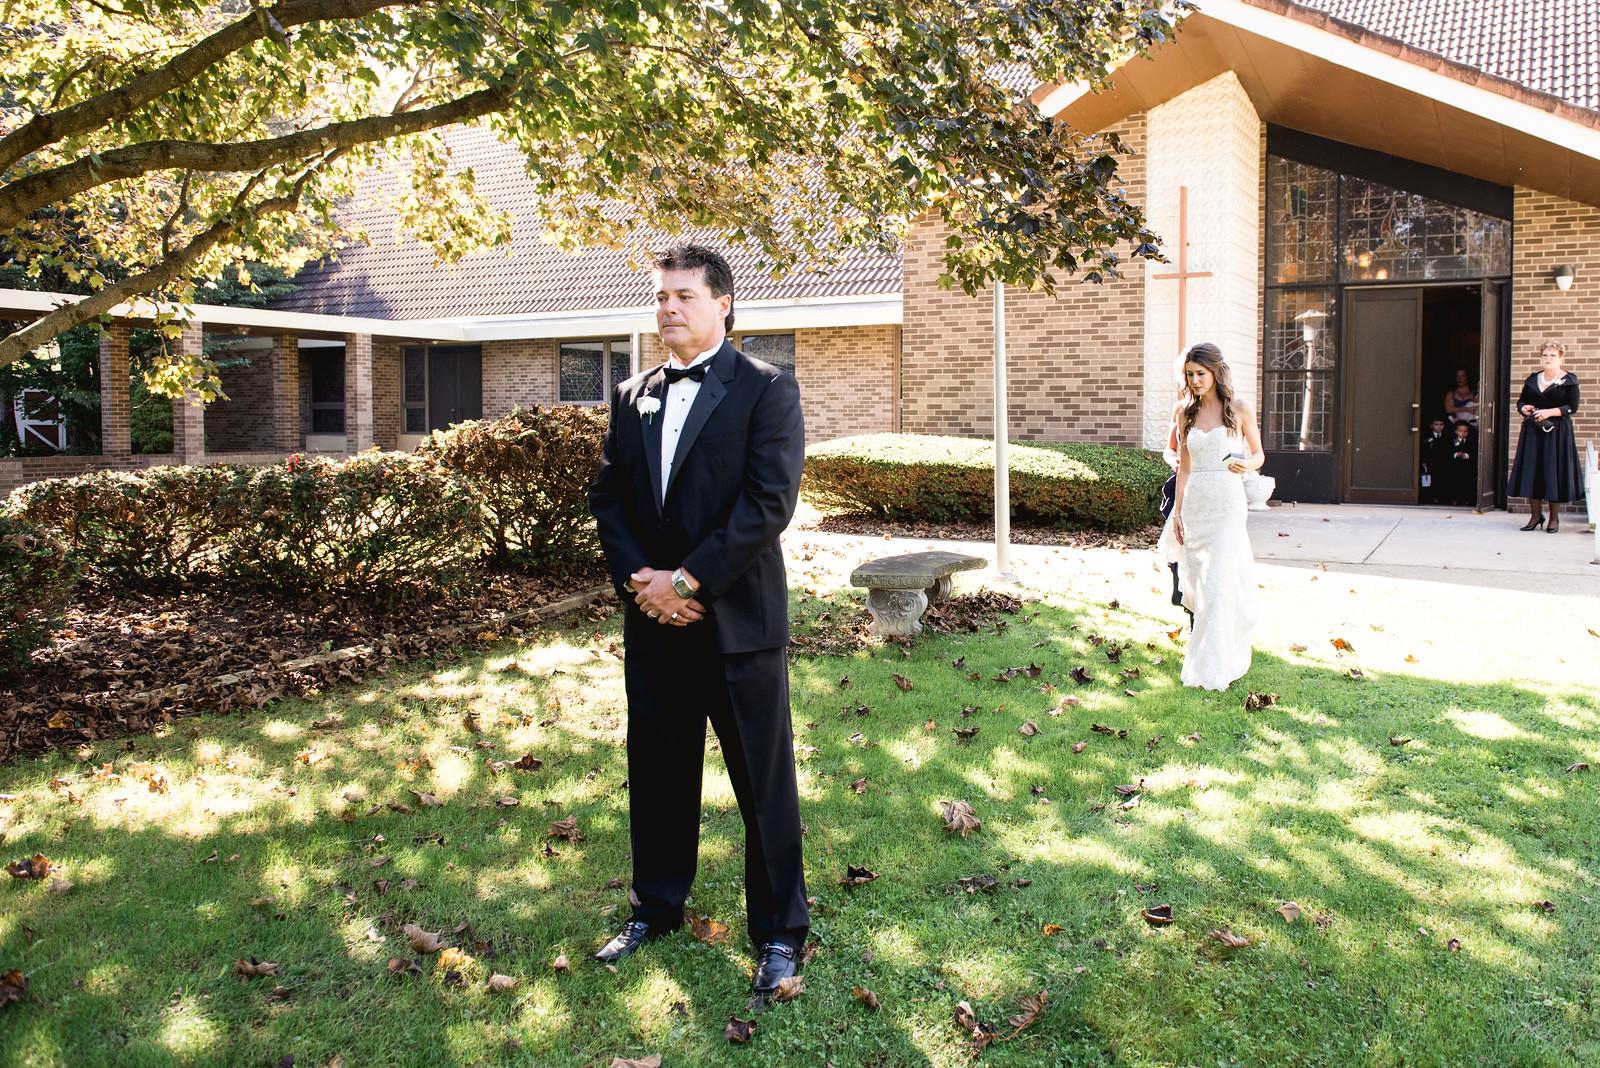 first_look_on_wedding_day2.jpg